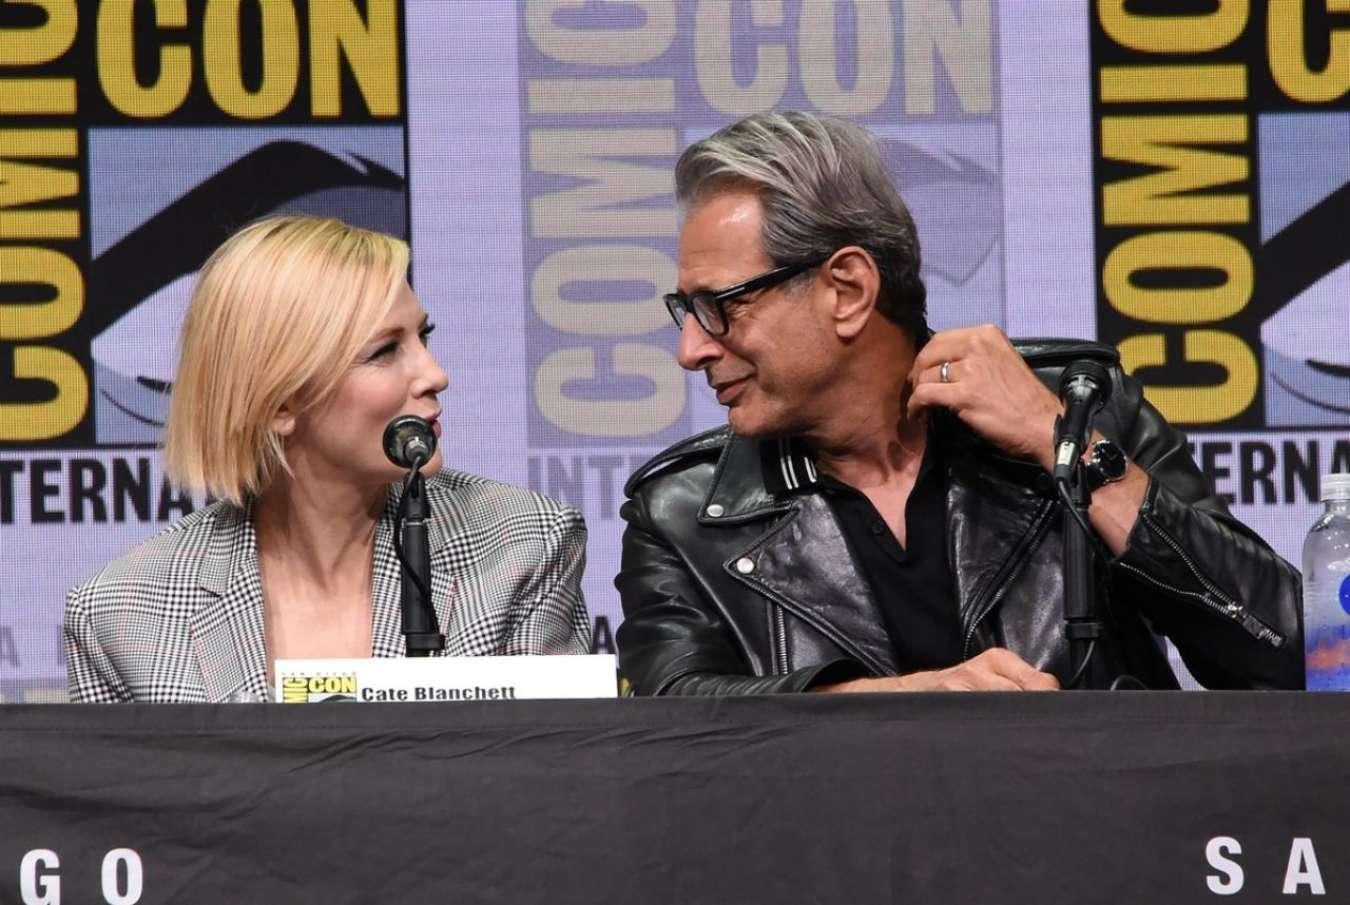 Cate Blanchett 2017 : Cate Blanchett: Marvel Studios Panel at San Diego Comic-Con 2017-06